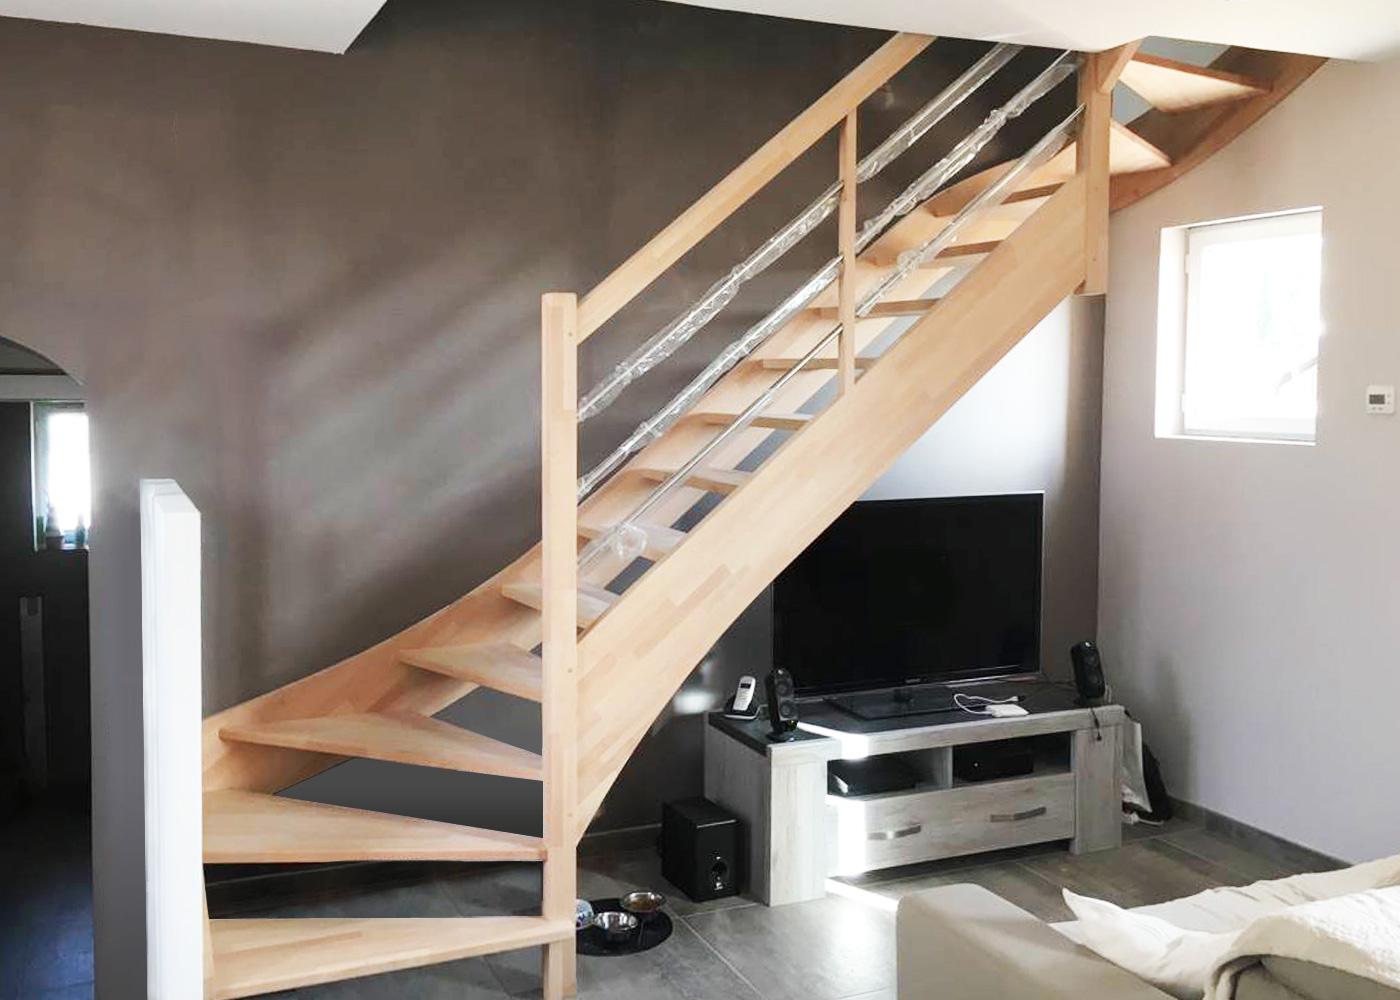 escalier en h tre atelier des monts d 39 or. Black Bedroom Furniture Sets. Home Design Ideas